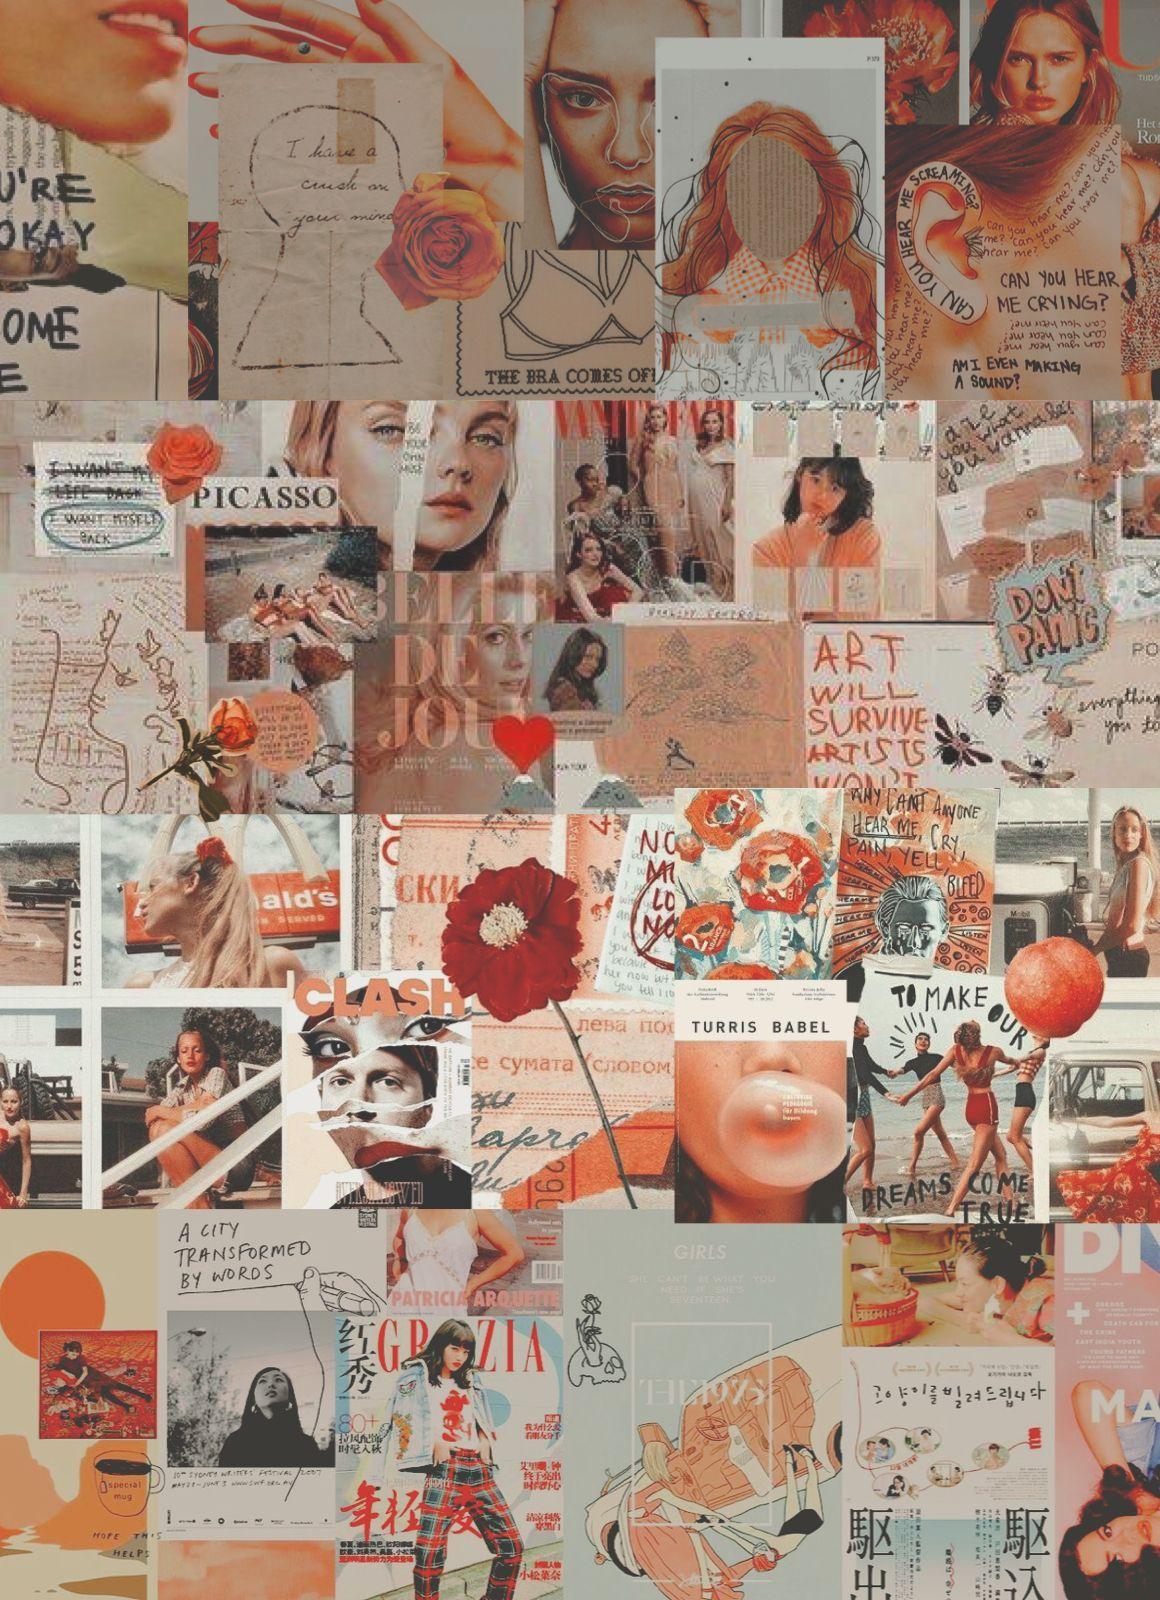 Iphonewallpapers Seni Abstrak Fotografi Seni Kertas Dinding